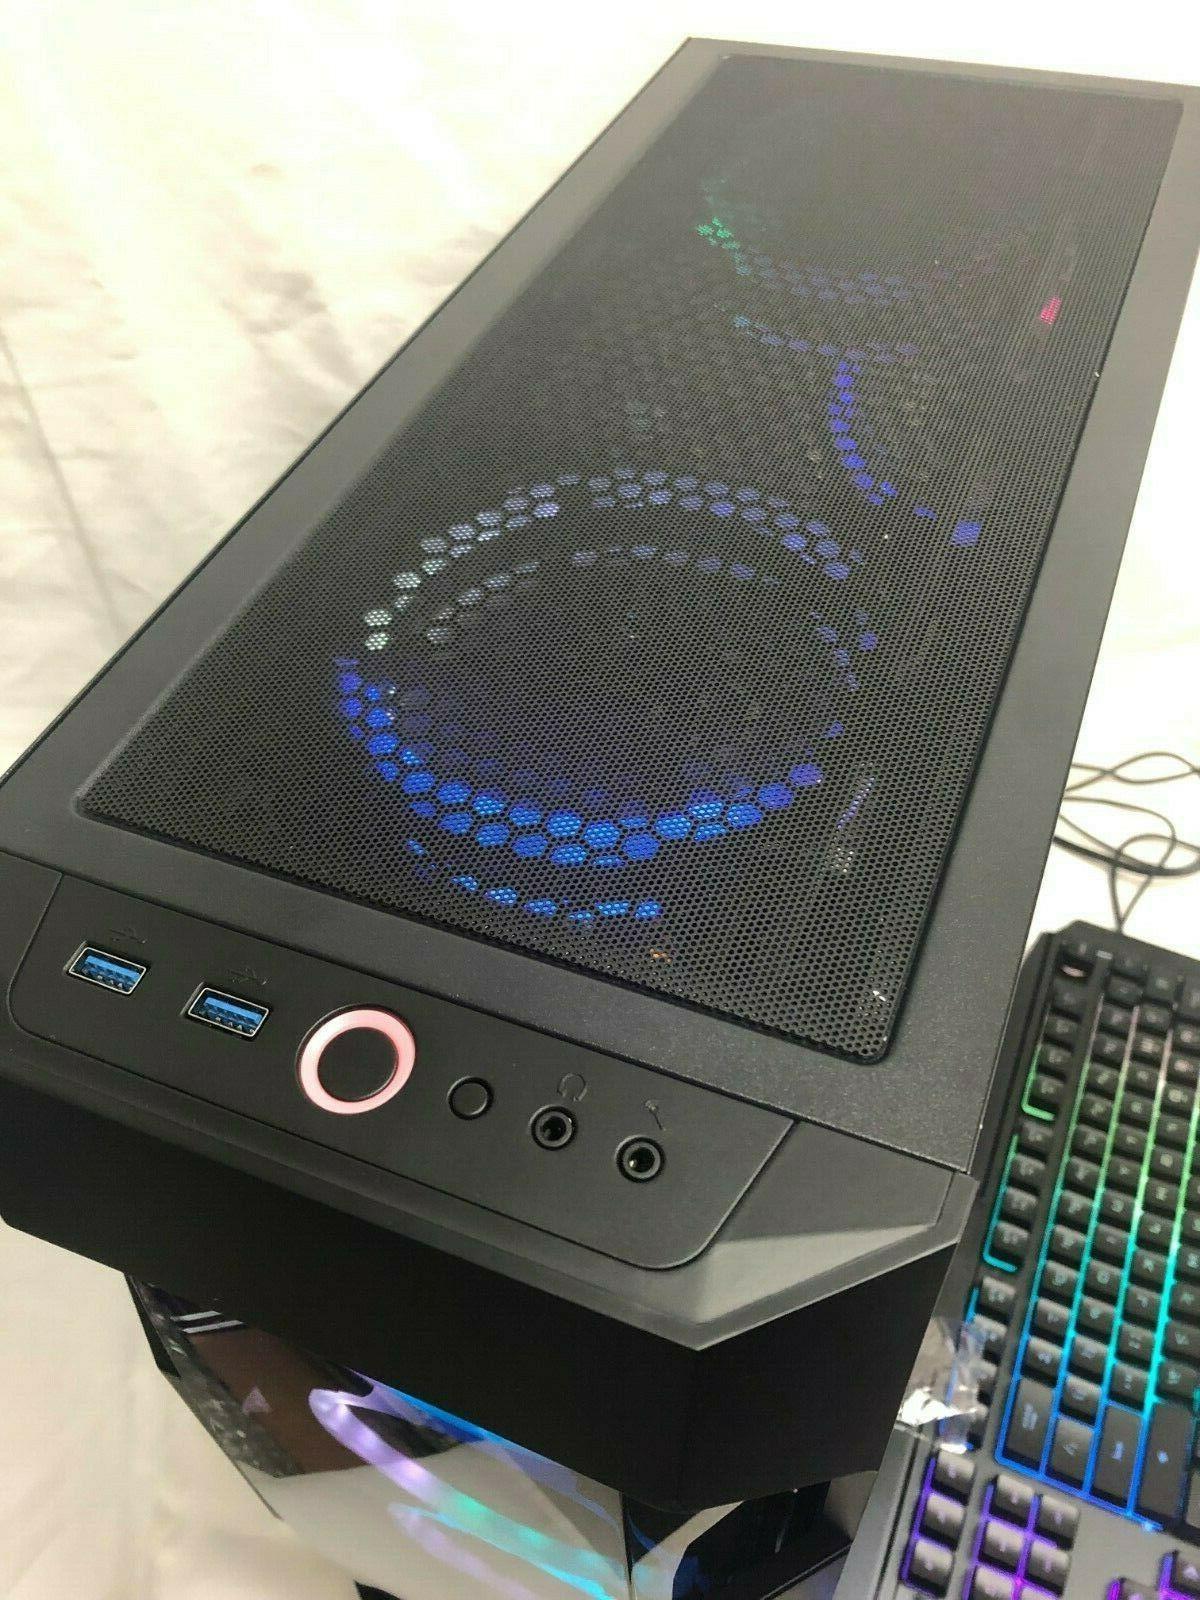 Gaming Intel i7-3.40GHz,120GB SSD,16GB,2TB,Nvidia